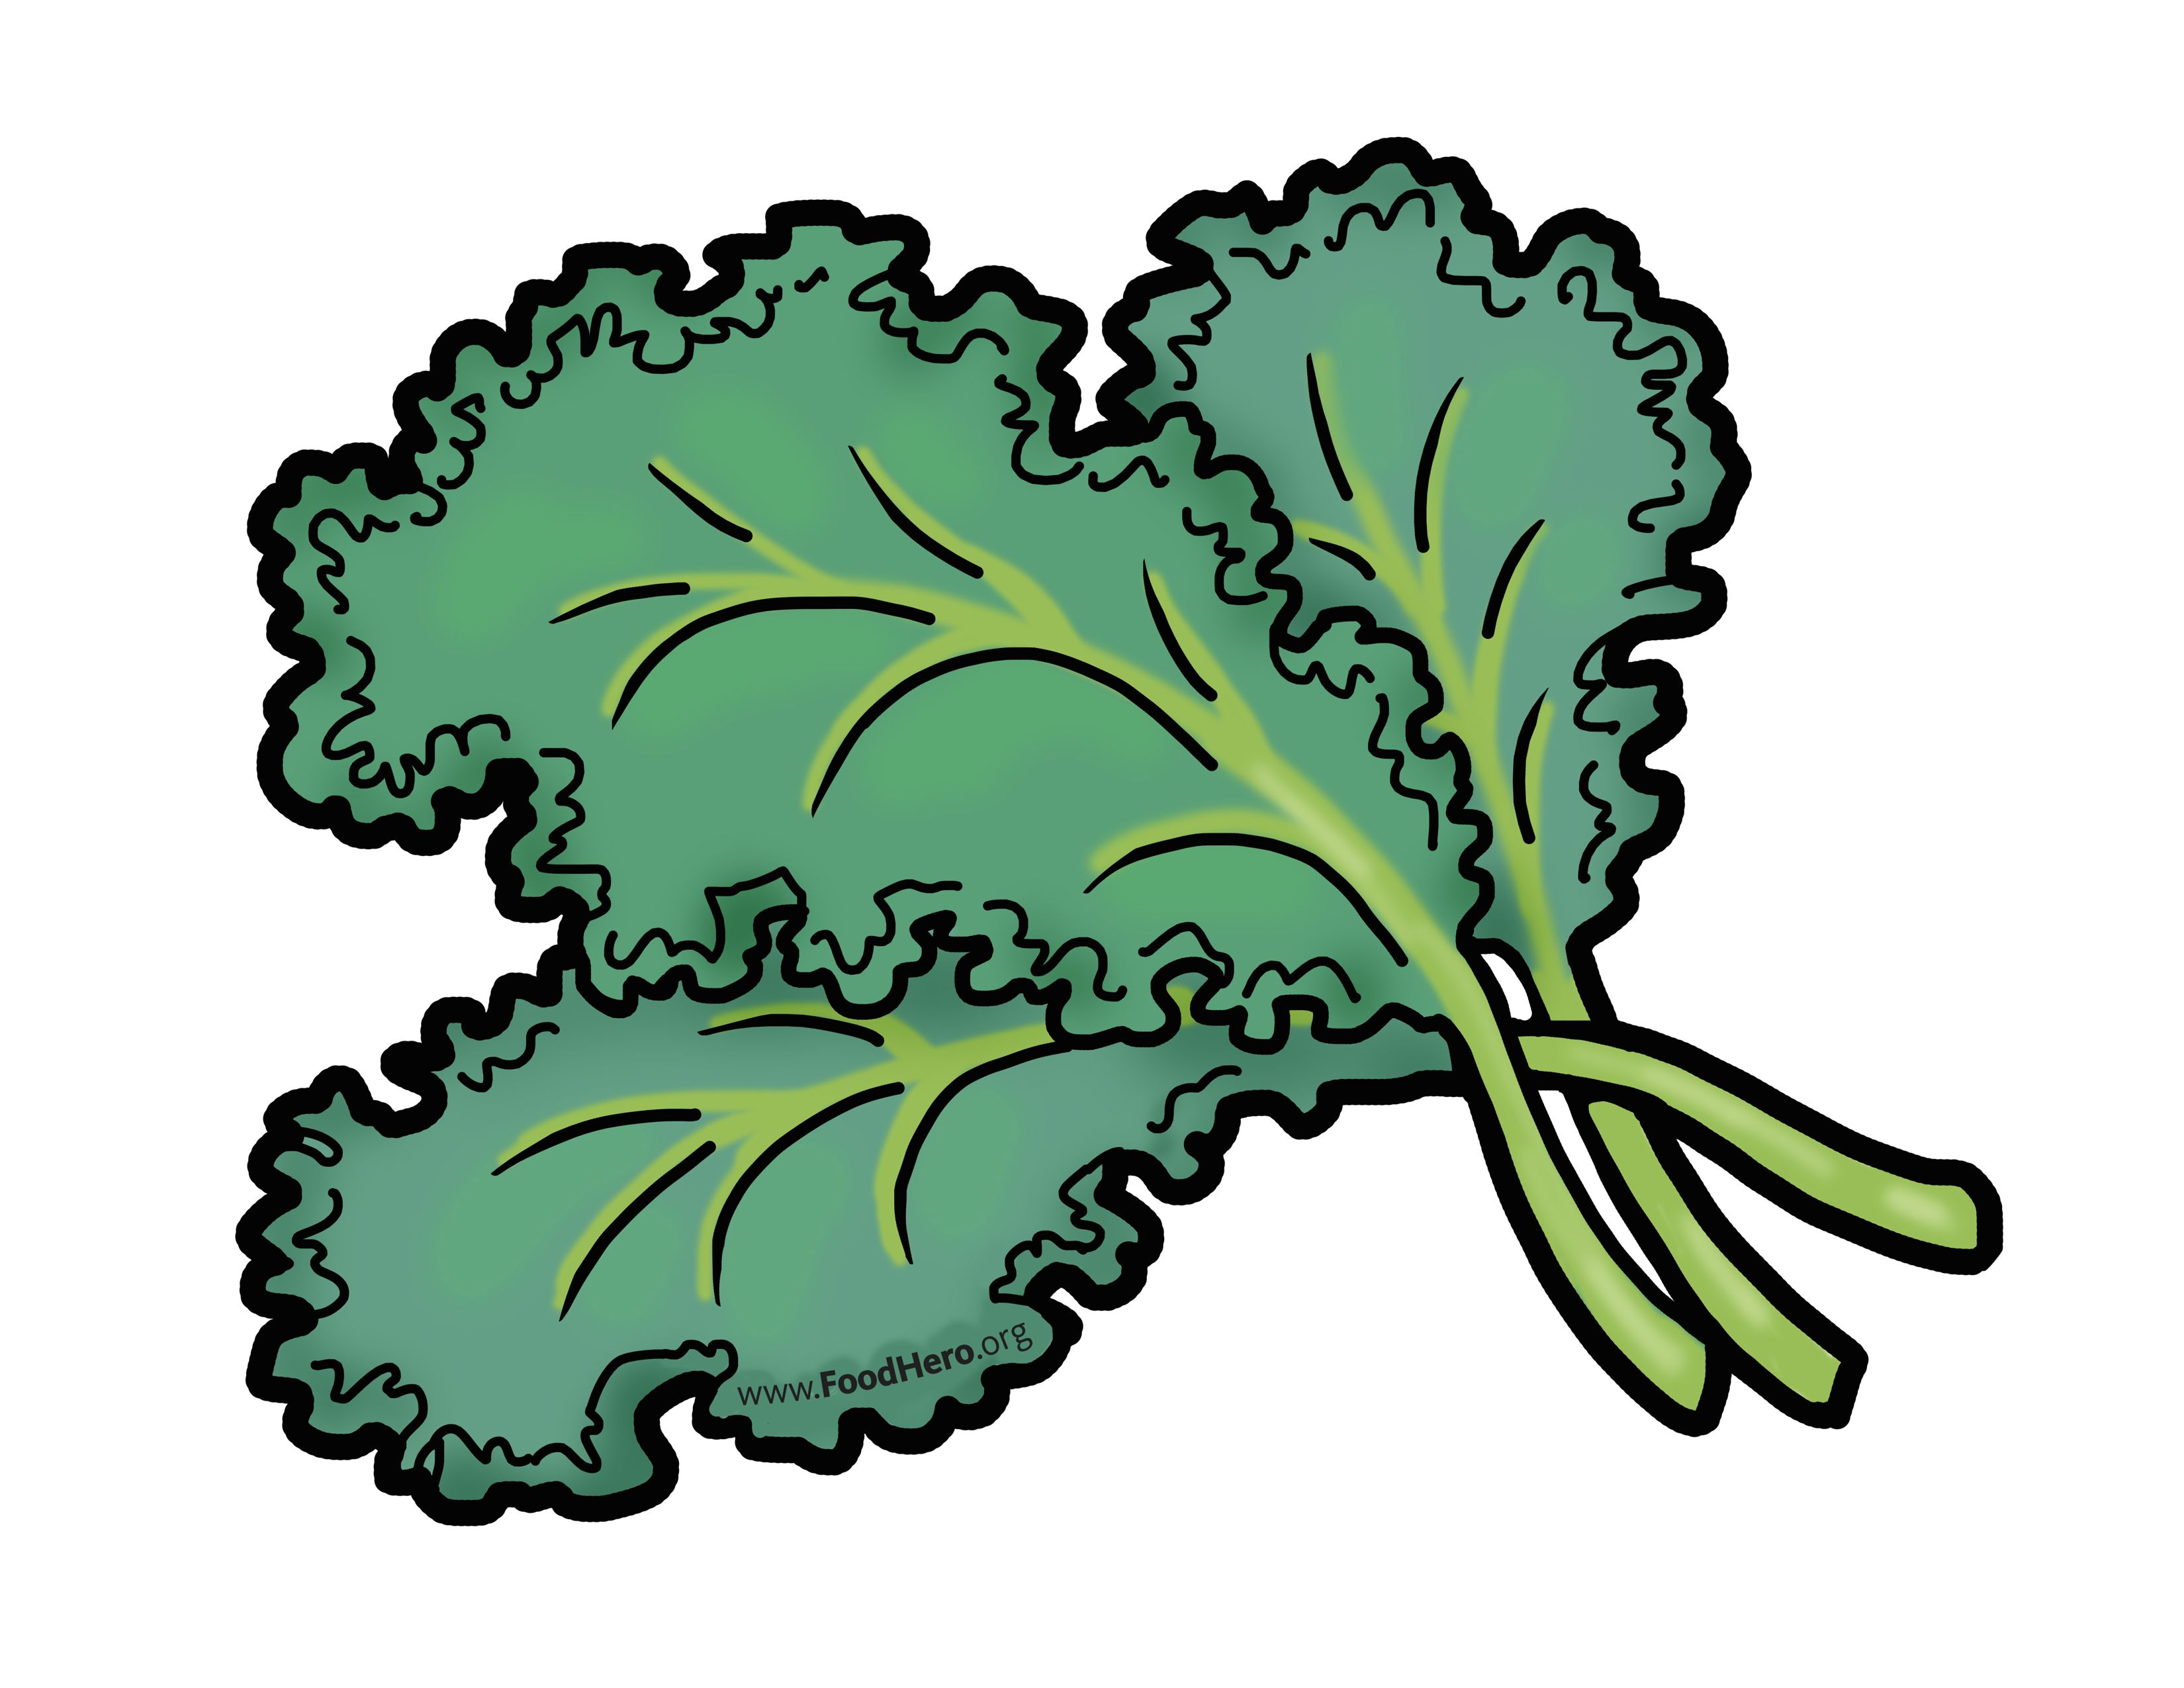 Kale illustration. Foodhero.org. #greens #bullentinboards #schoolart.